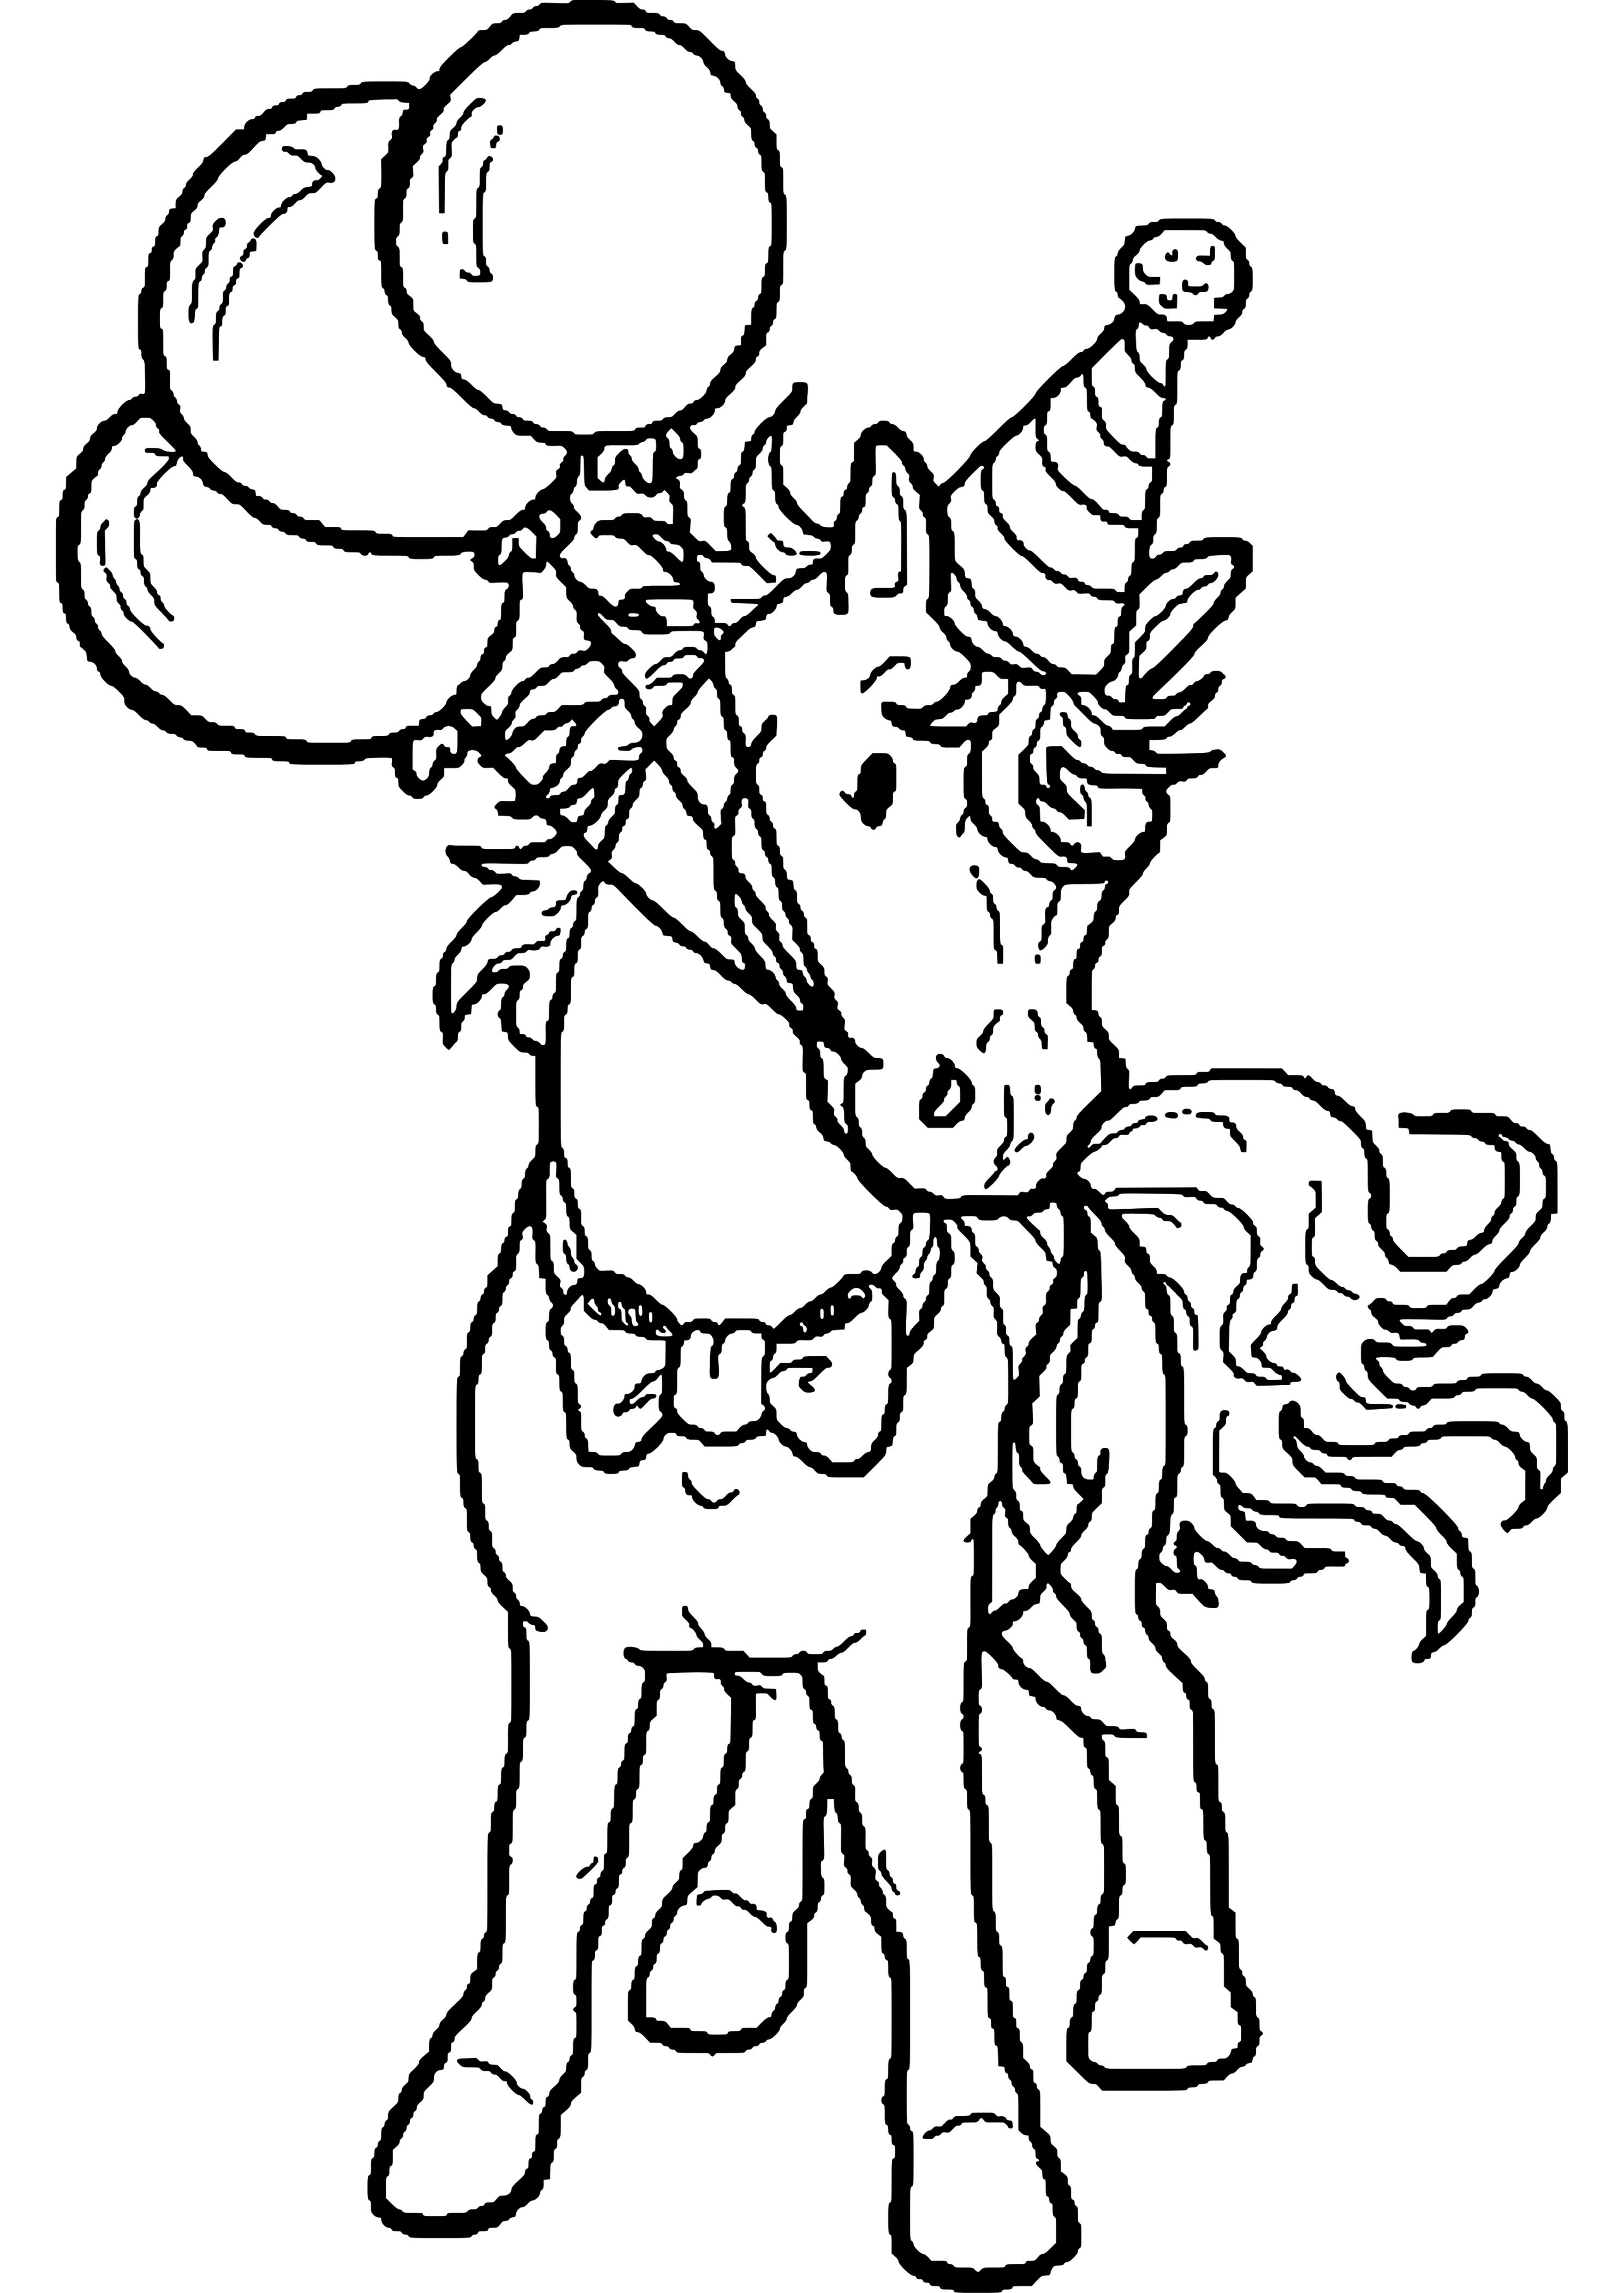 Ausmalbilder Pferde Geburtstag | Coloring Pages | Pinterest | Adult ...